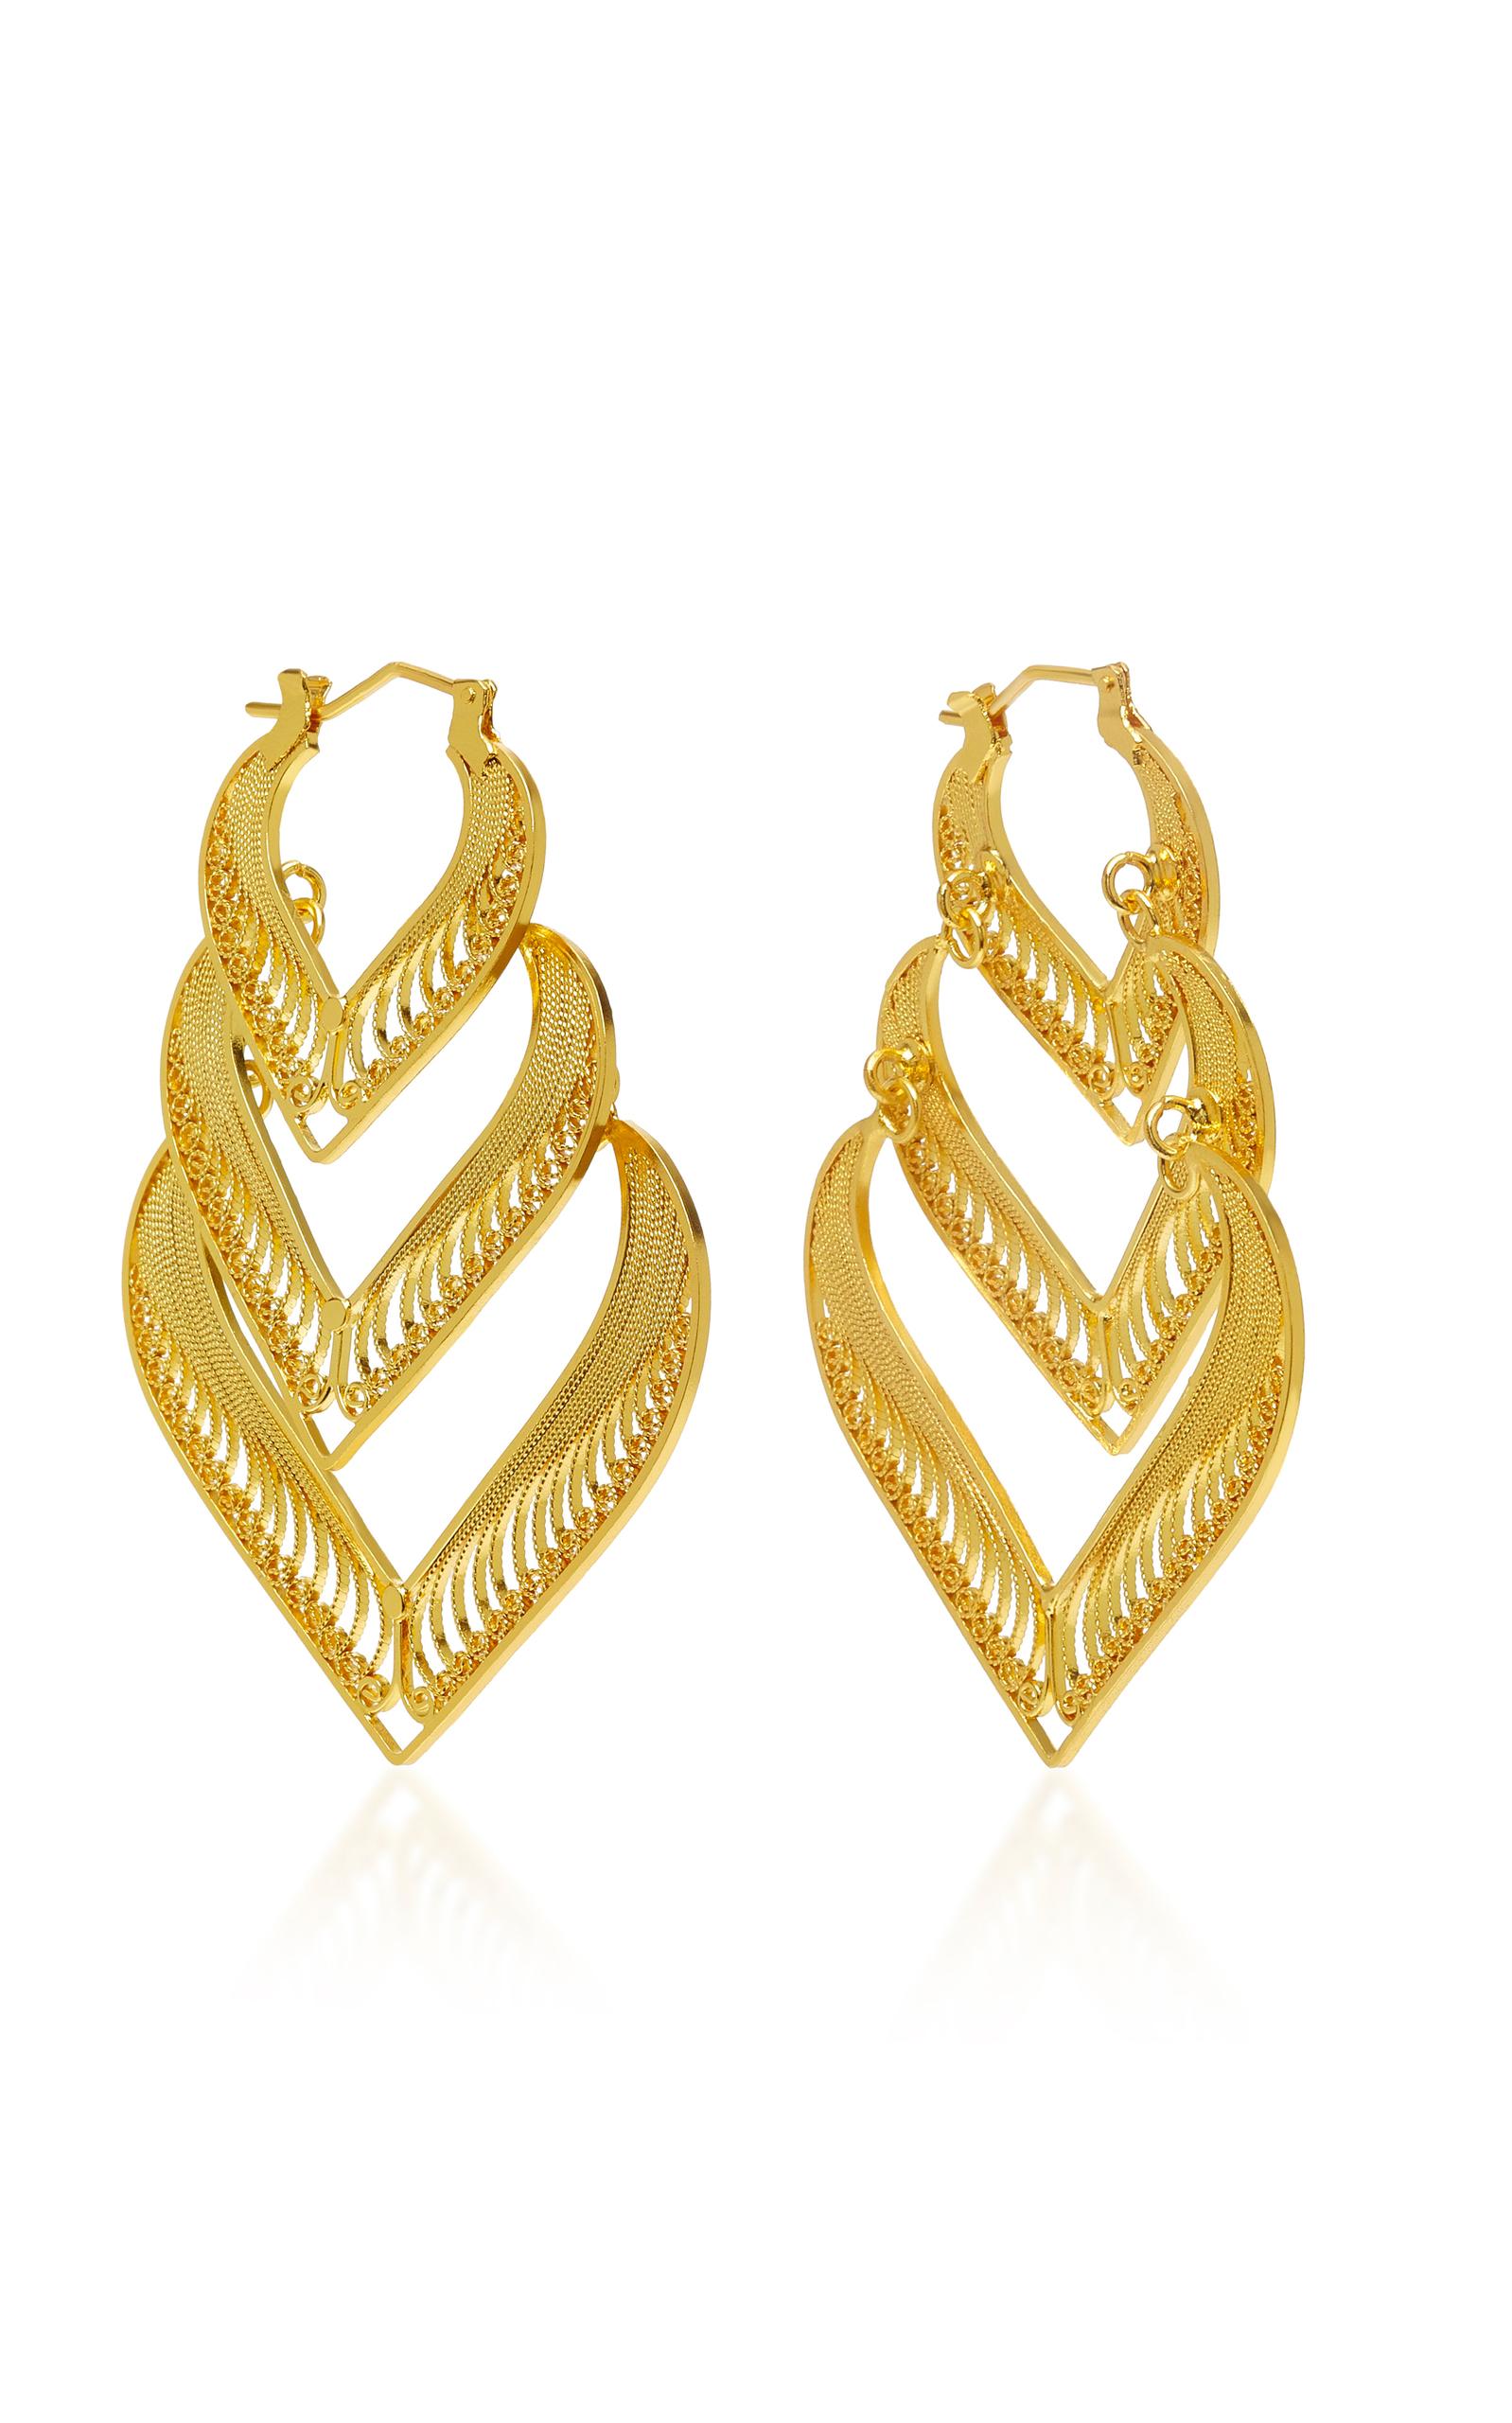 MALLARINO KORA STERLING SILVER AND 24K GOLD VERMEIL EARRINGS